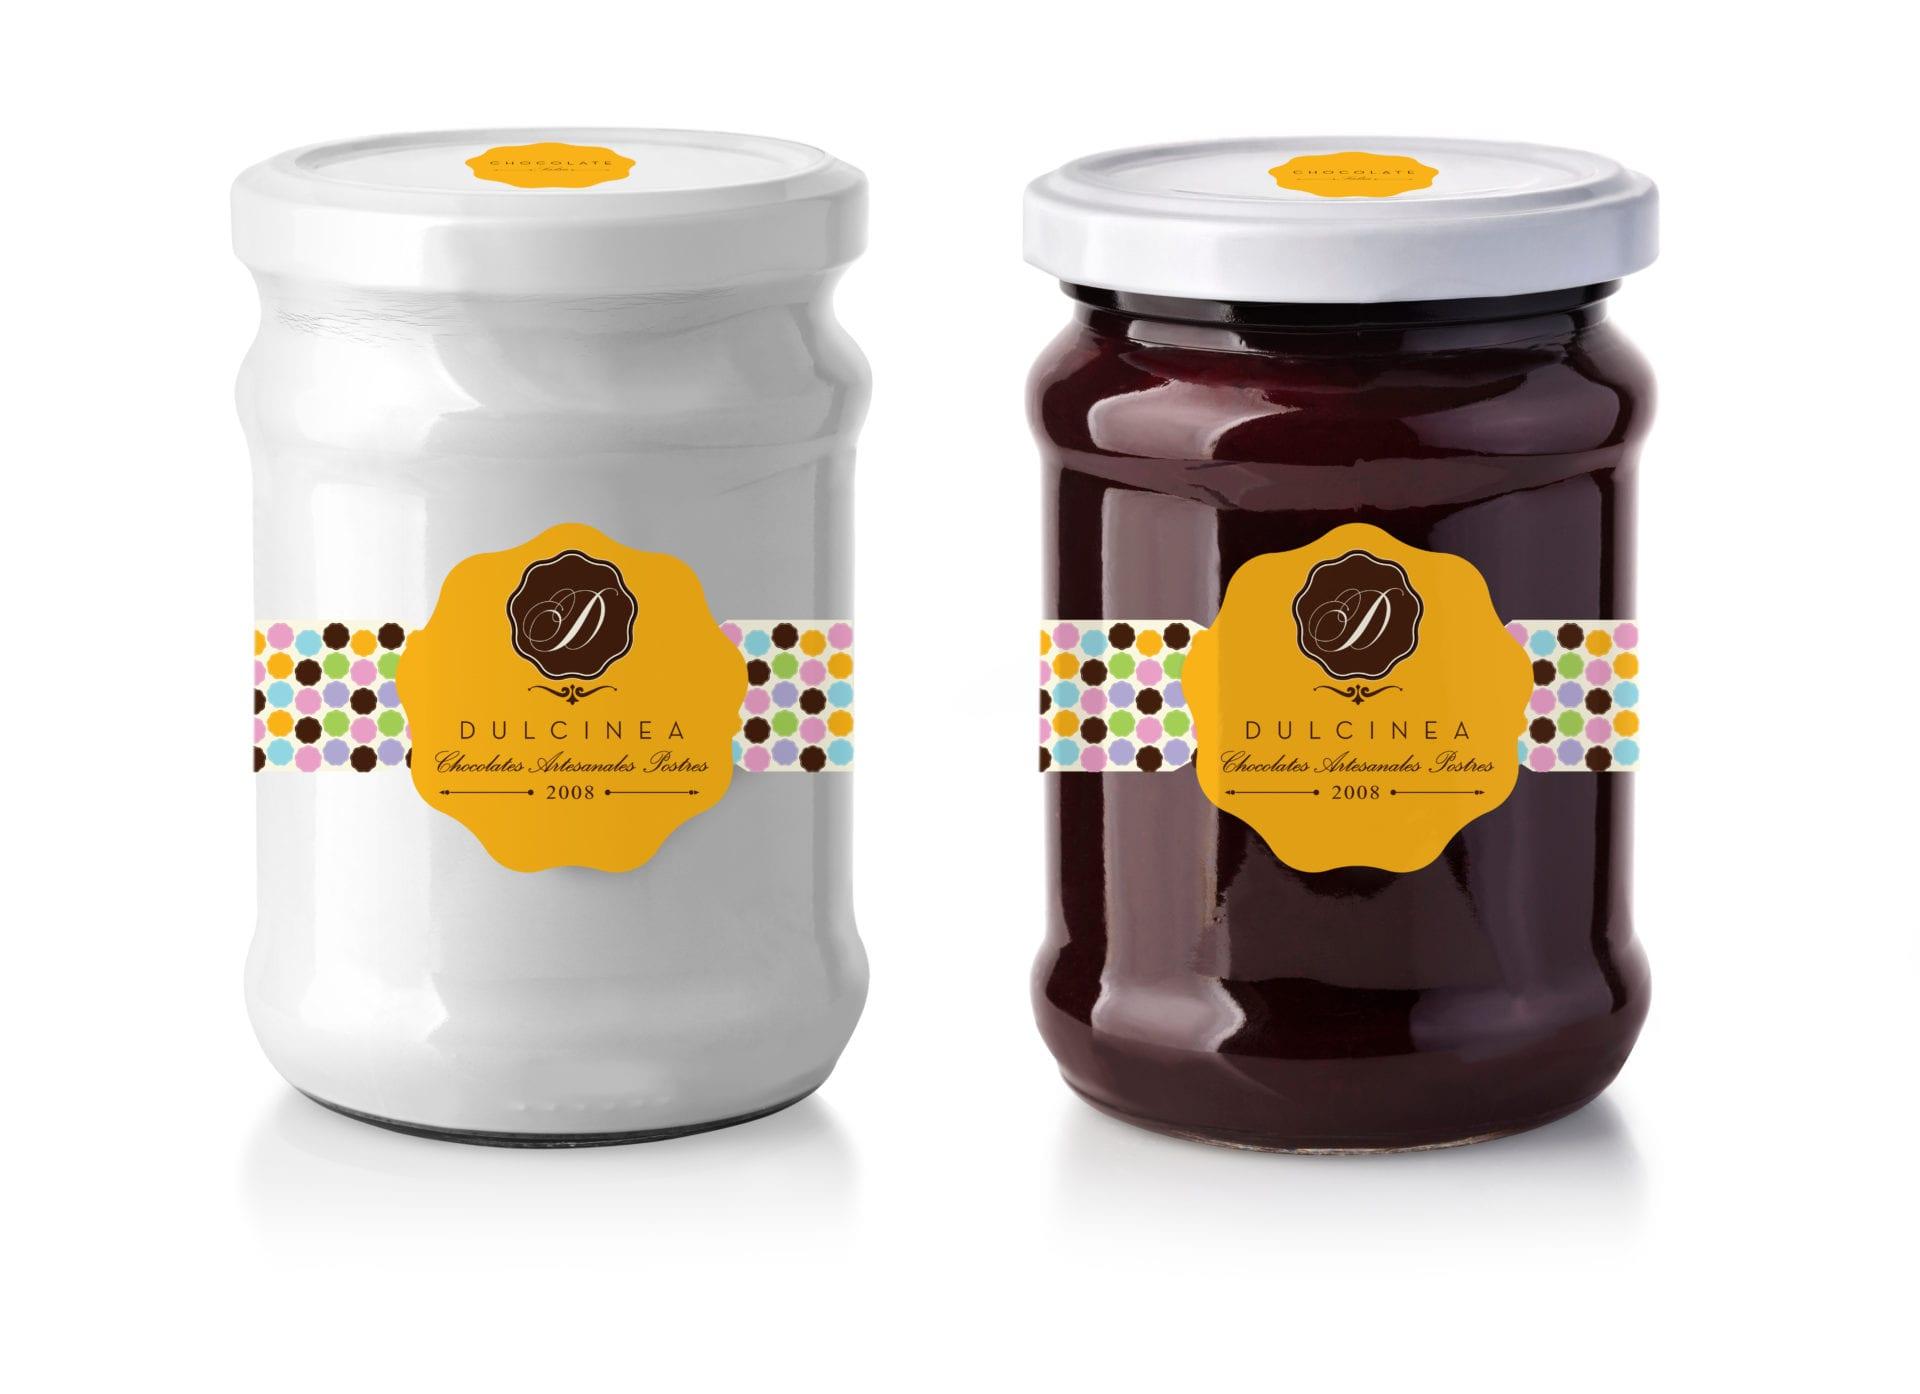 Jars of Dulcinea chocolate